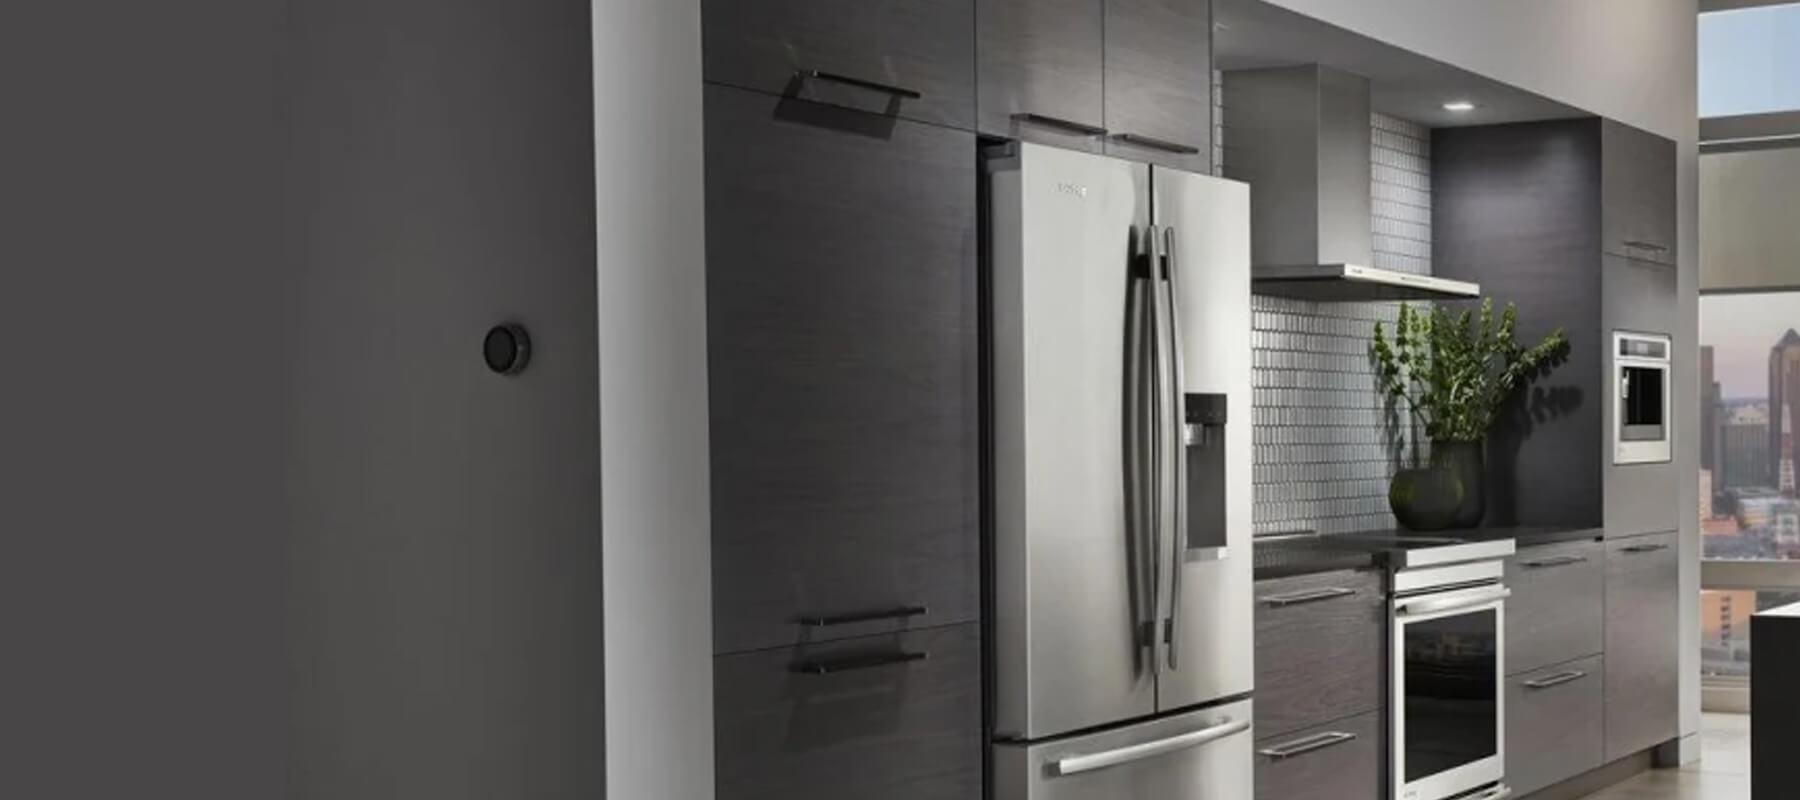 Jenn Air Authorized Built in Refrigerator Service | Built-in Refrigerator Repair